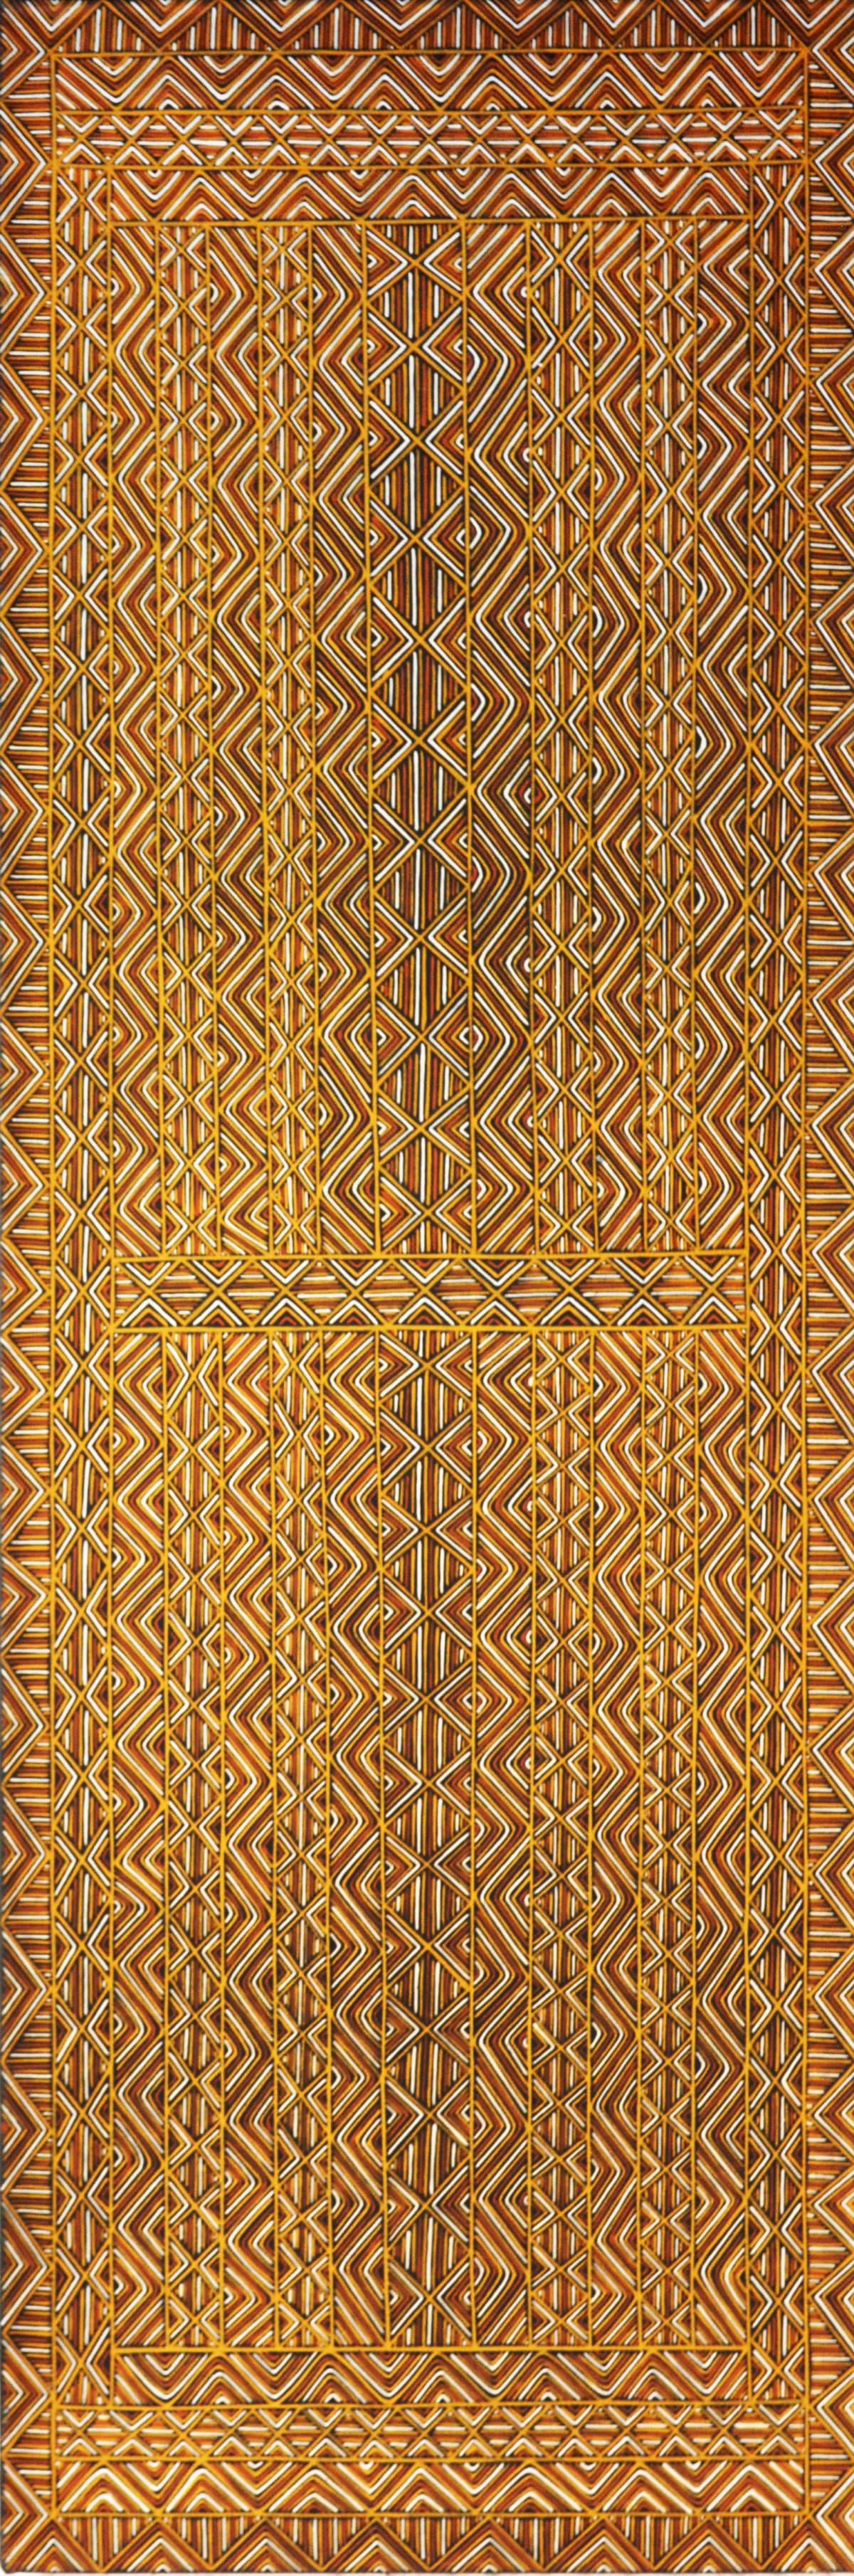 Nicholas Mario Jilamara natural ochres on canvas 180 x 60 cm